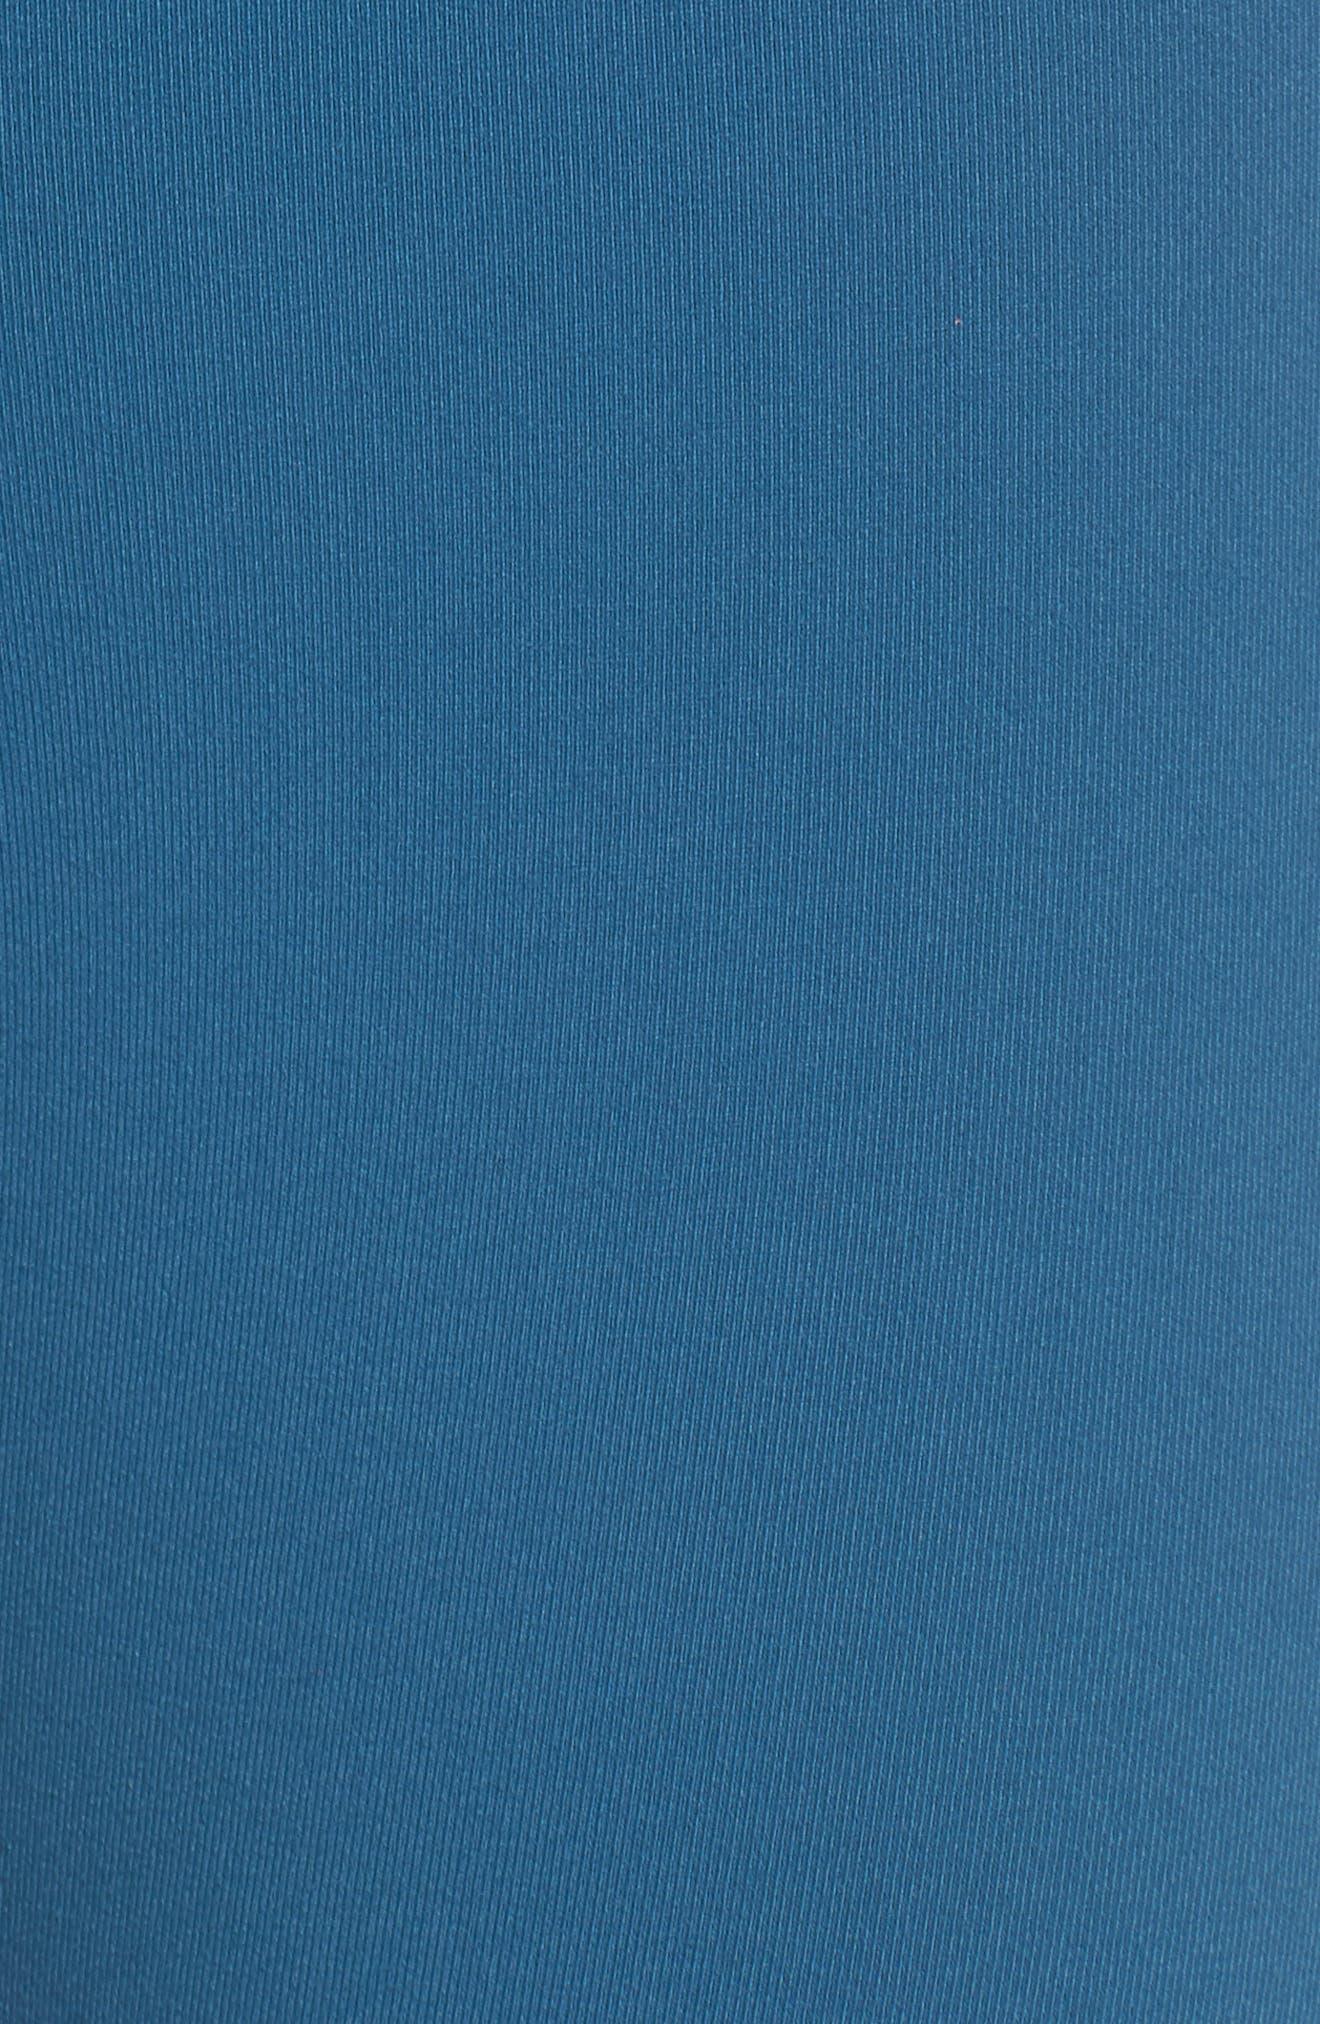 ,                             Coast High Waist Stirrup Leggings,                             Alternate thumbnail 37, color,                             402